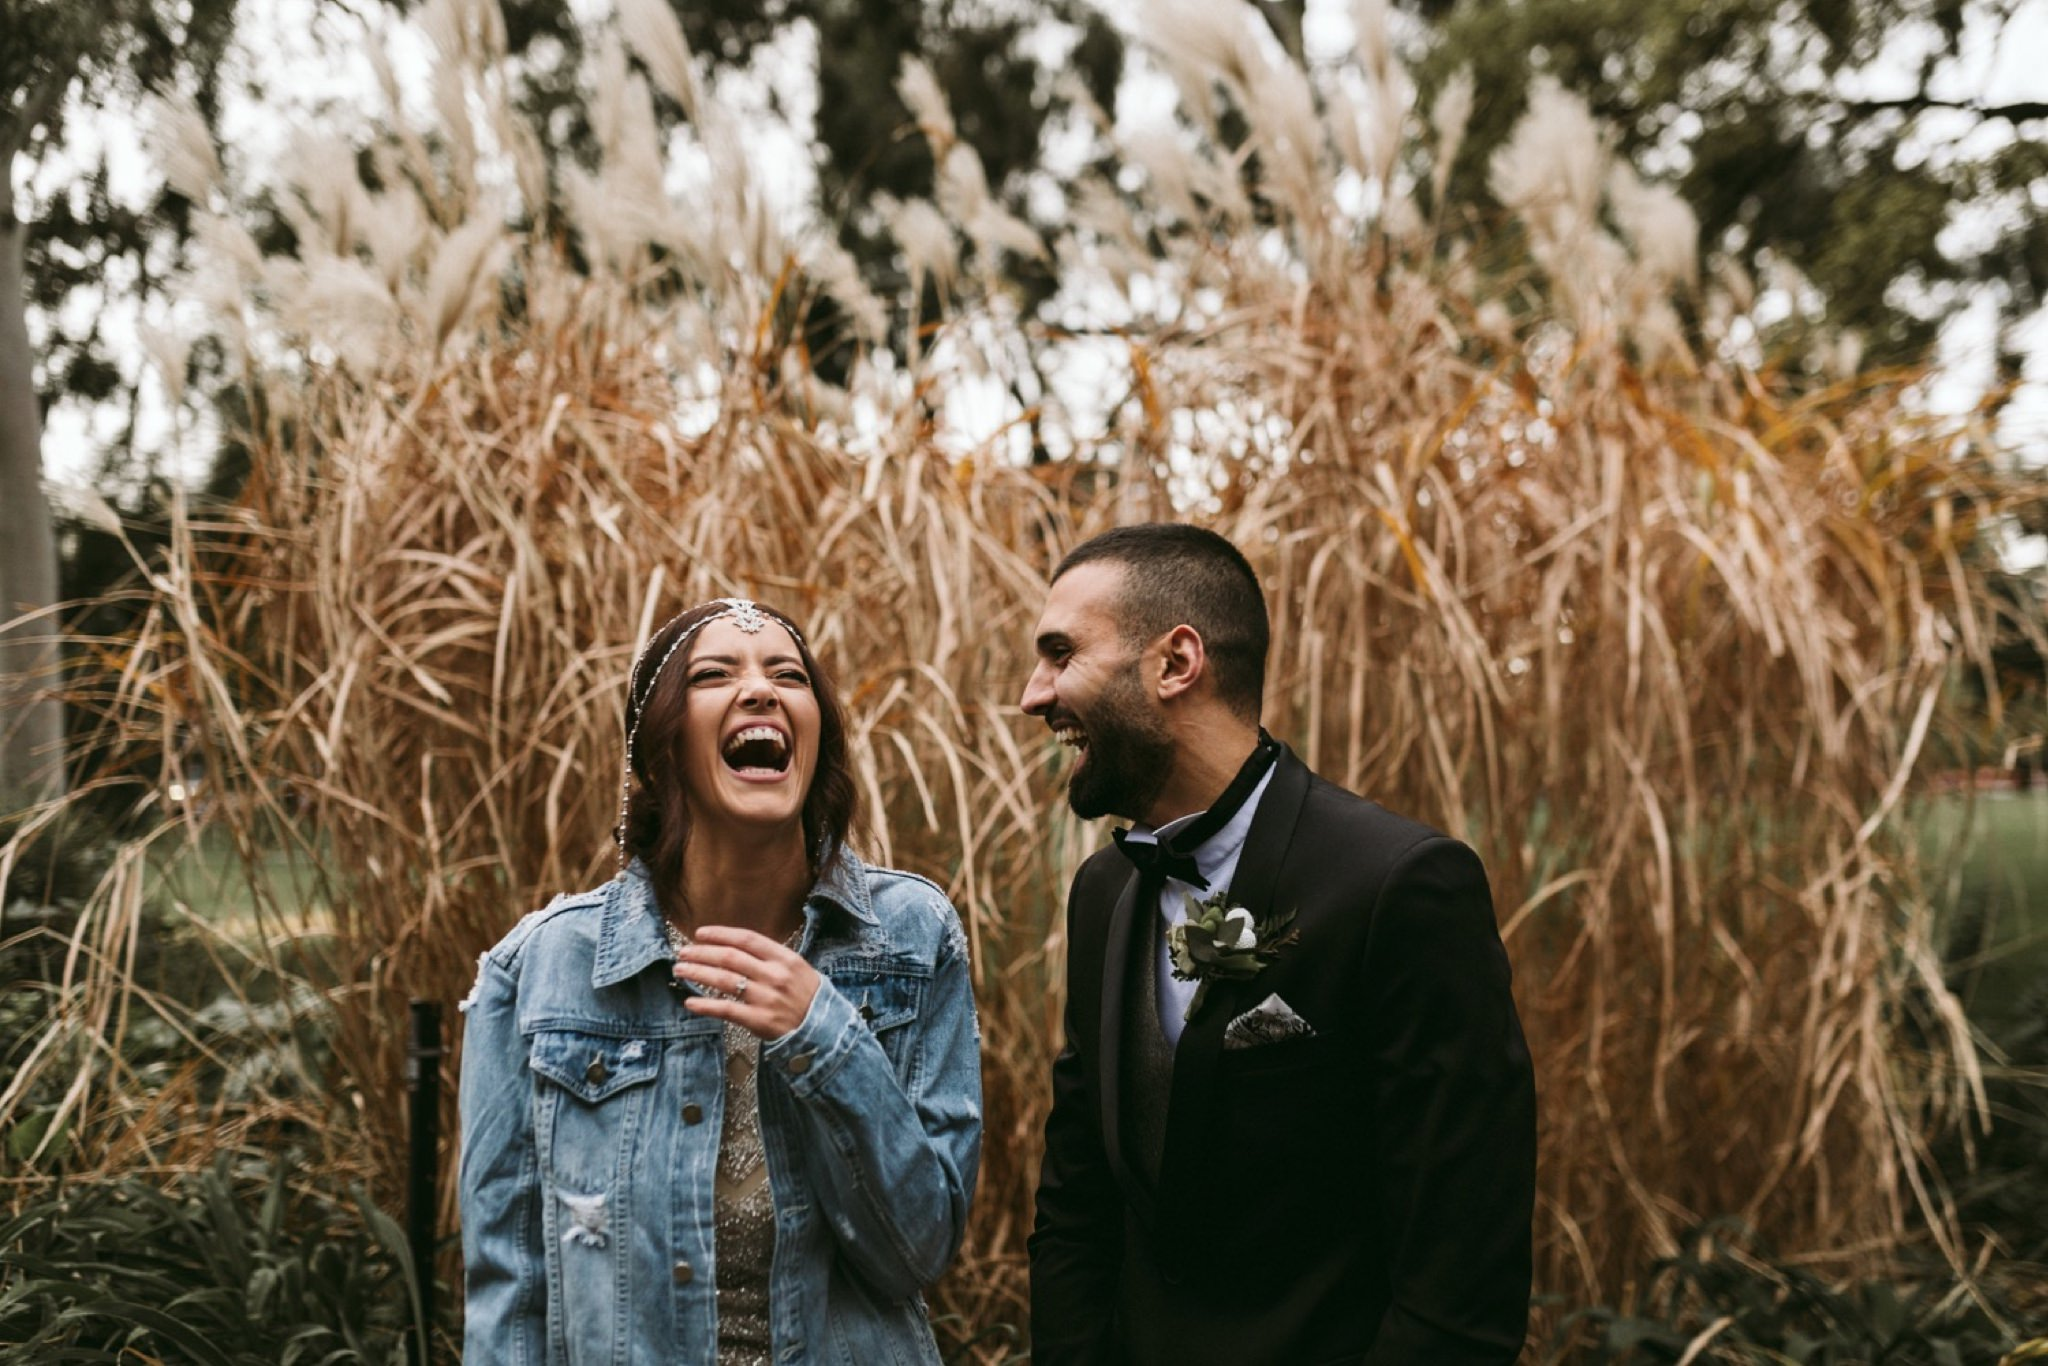 Anthony & Esra Photo: @goldandgrit